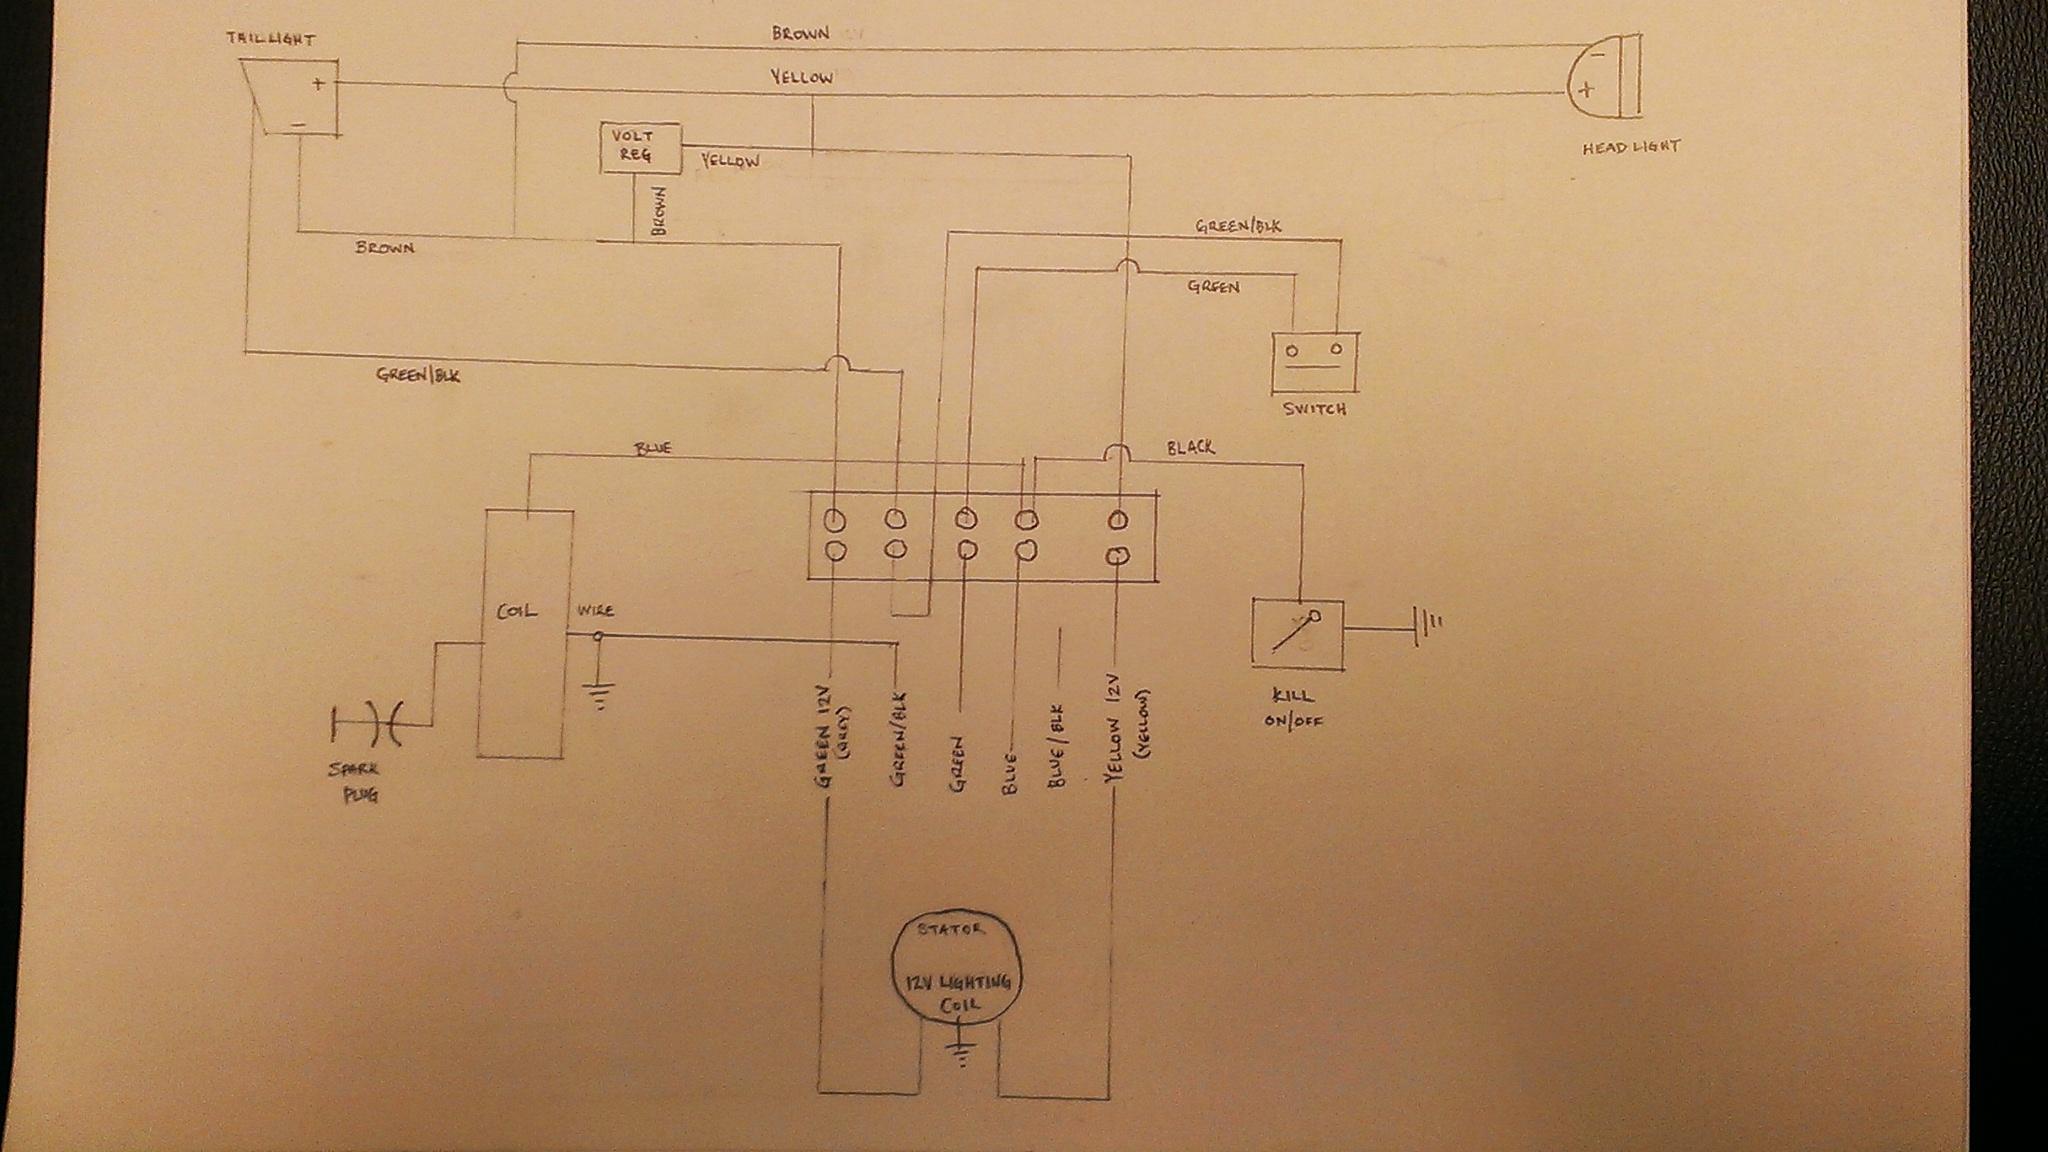 Trail Tech Regulator Wiring Diagram Printable Wiring Diagram